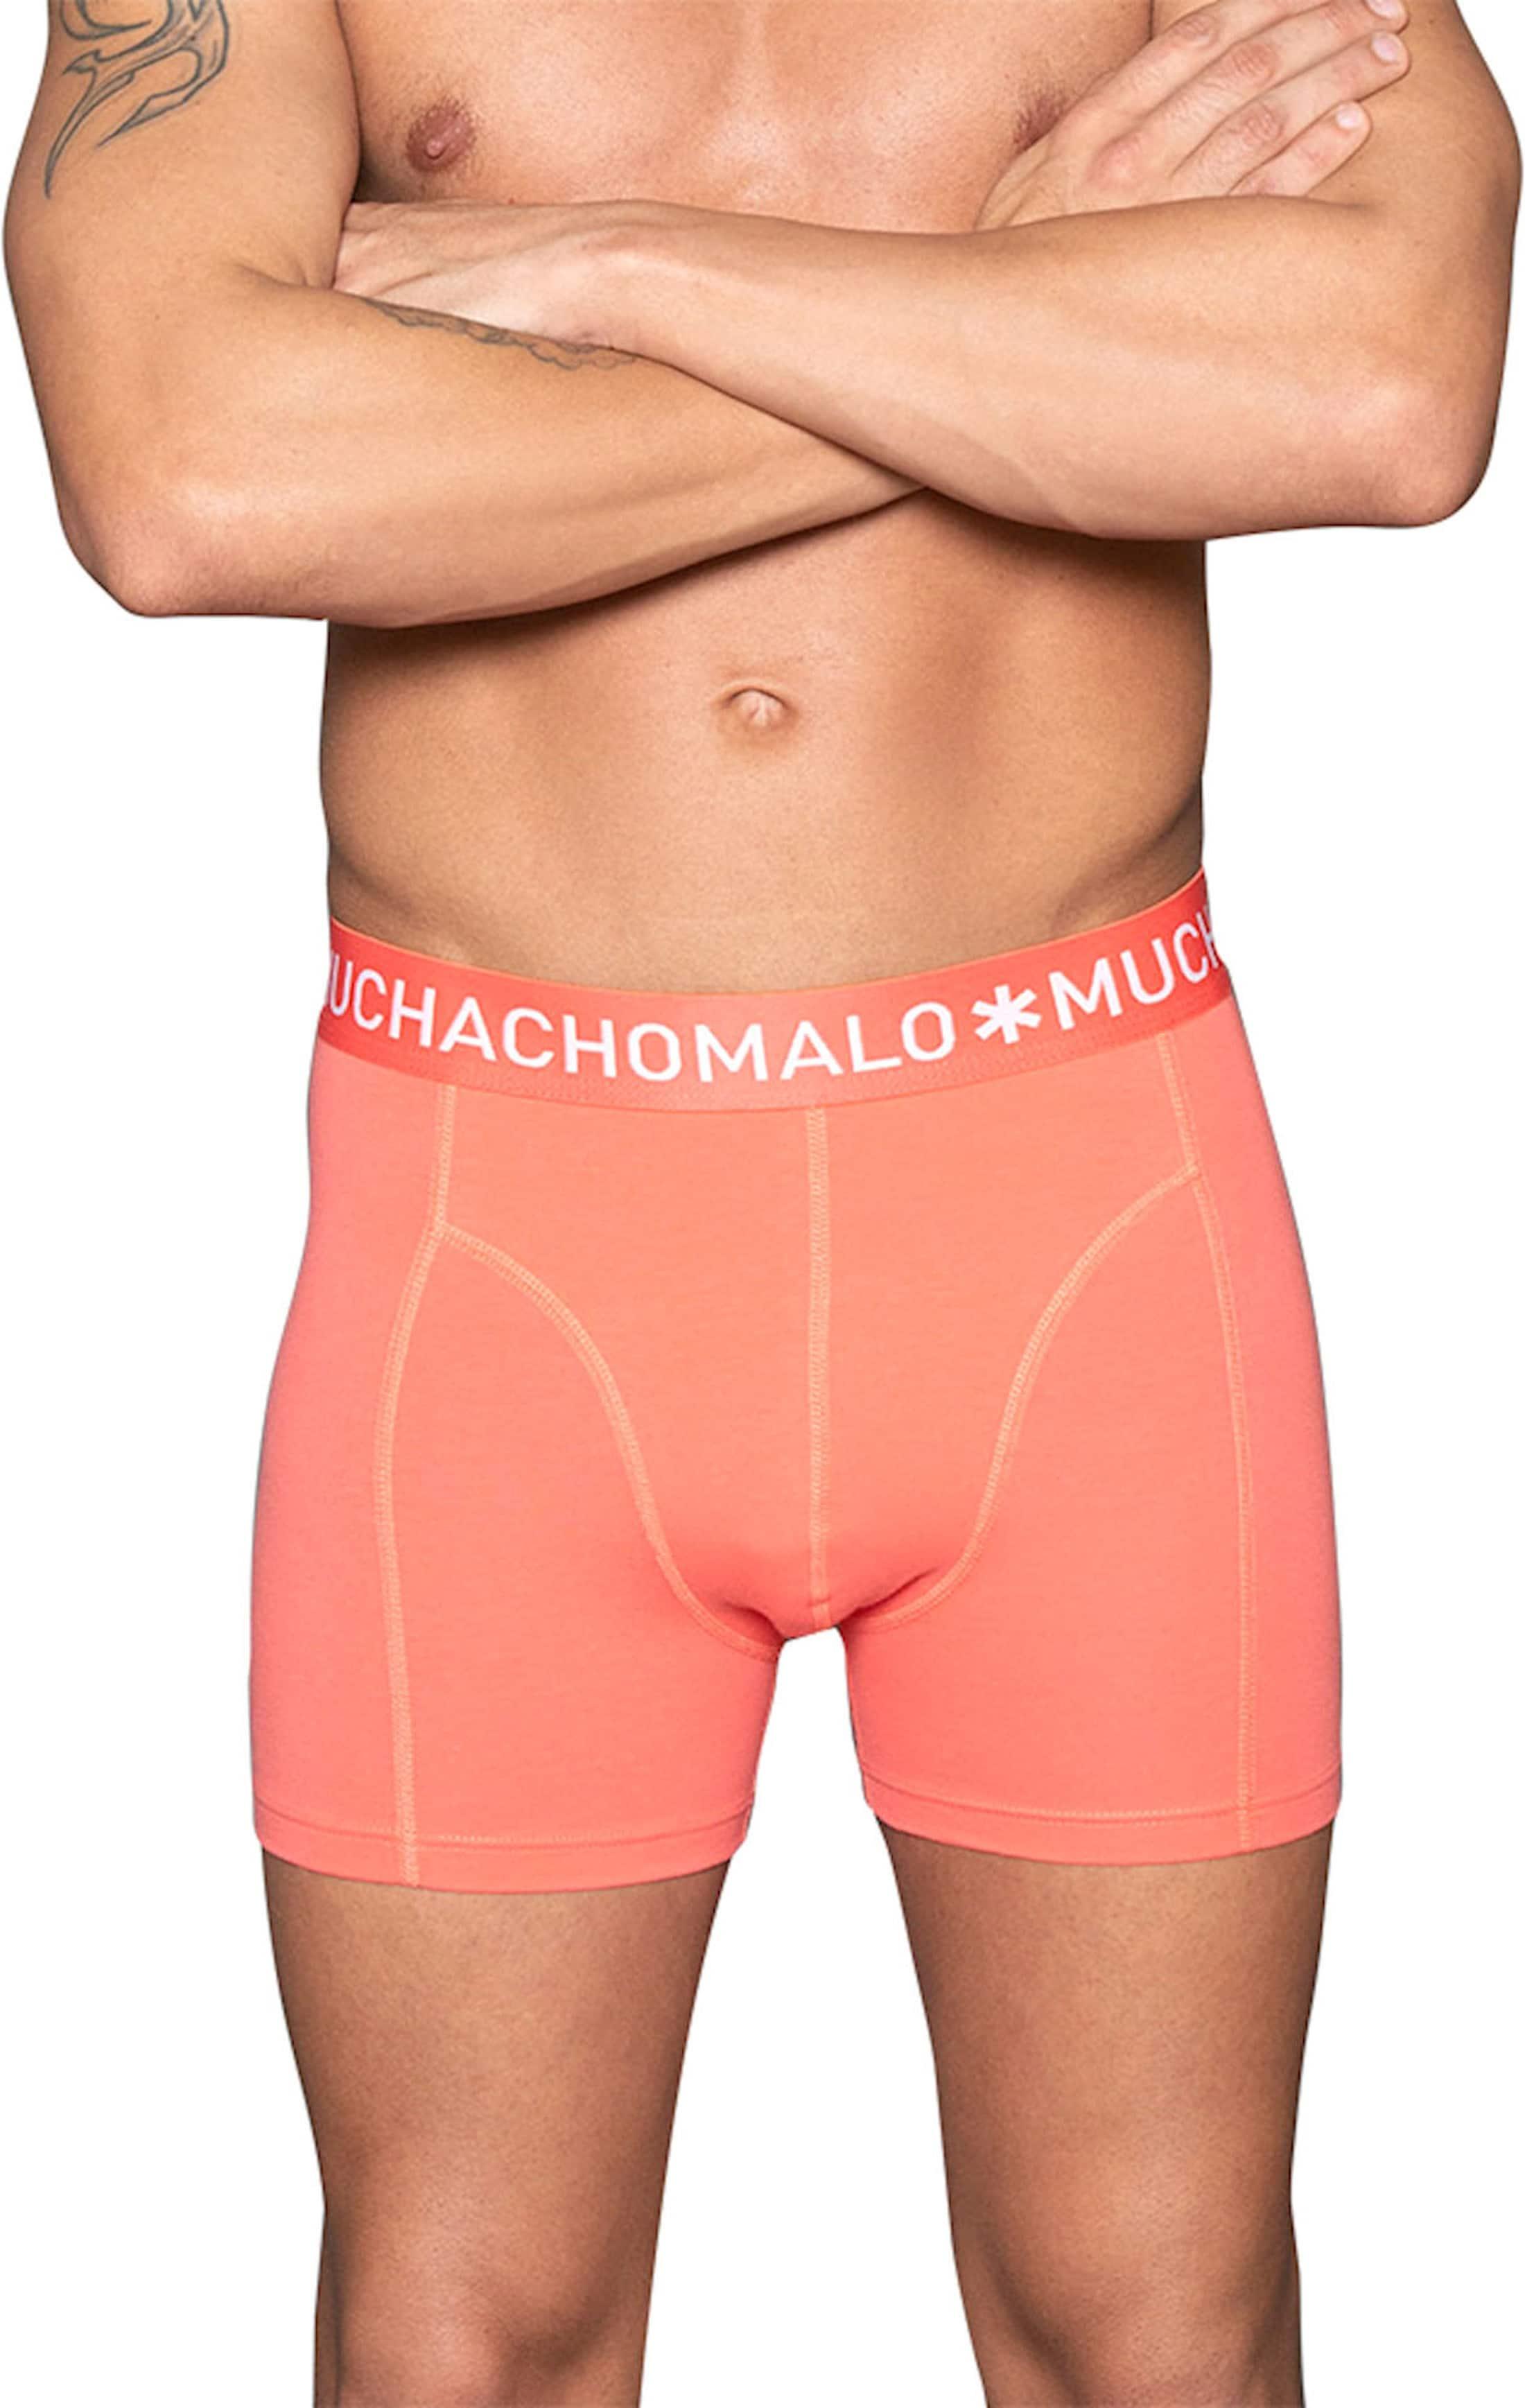 Muchachomalo Boxershorts 2-Pack 272